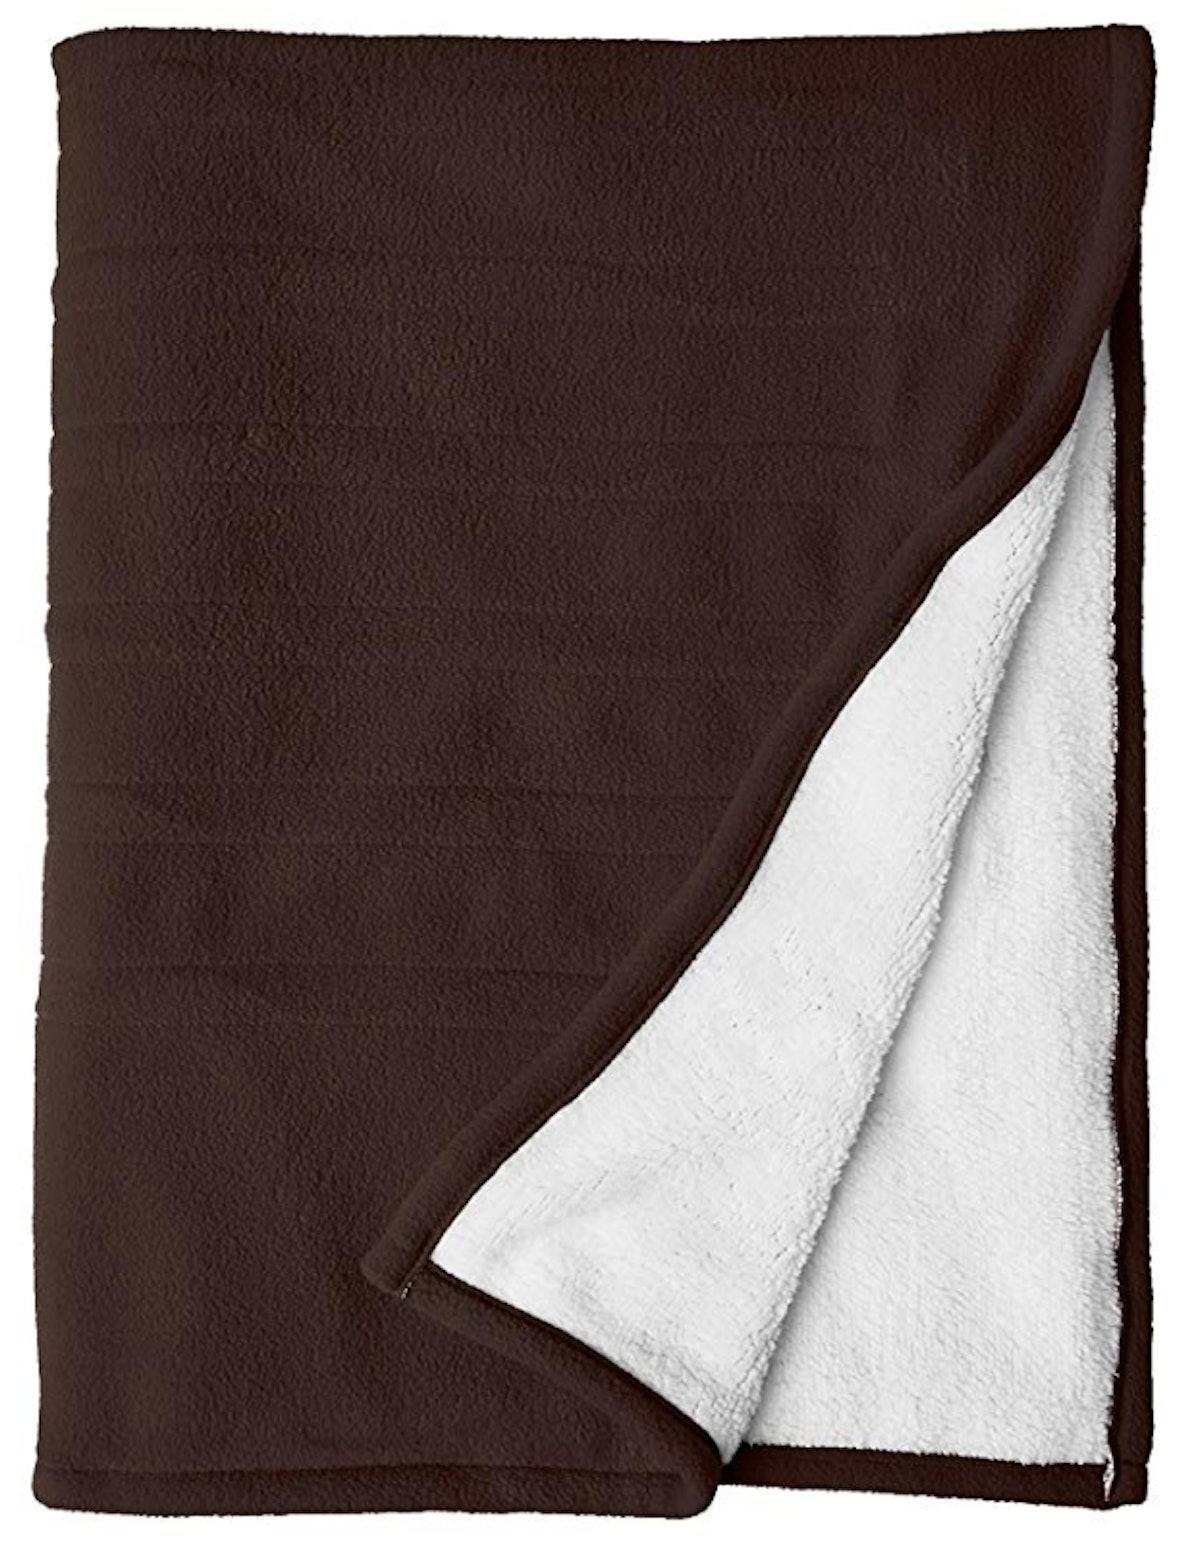 Serta Reversible Heated Throw Blanket